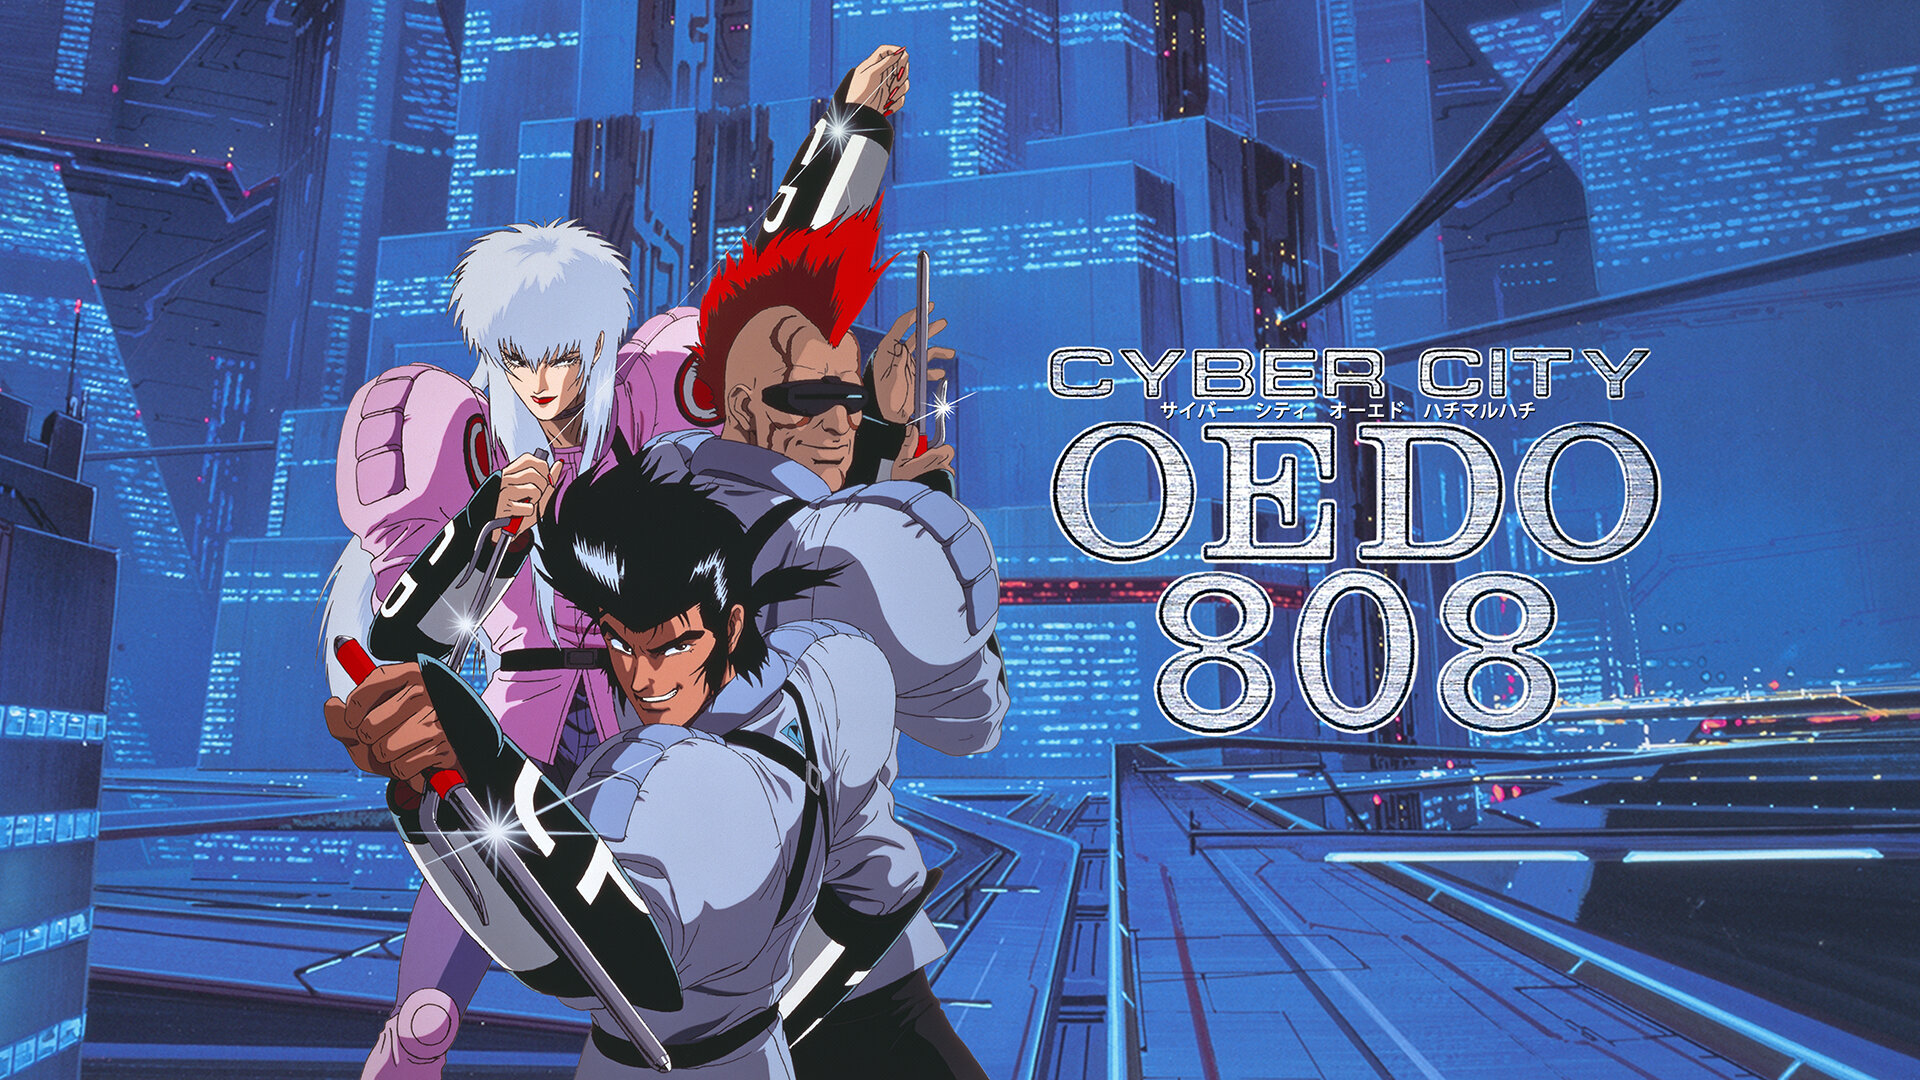 CYBER CITY OEDO 808(dアニメストア)